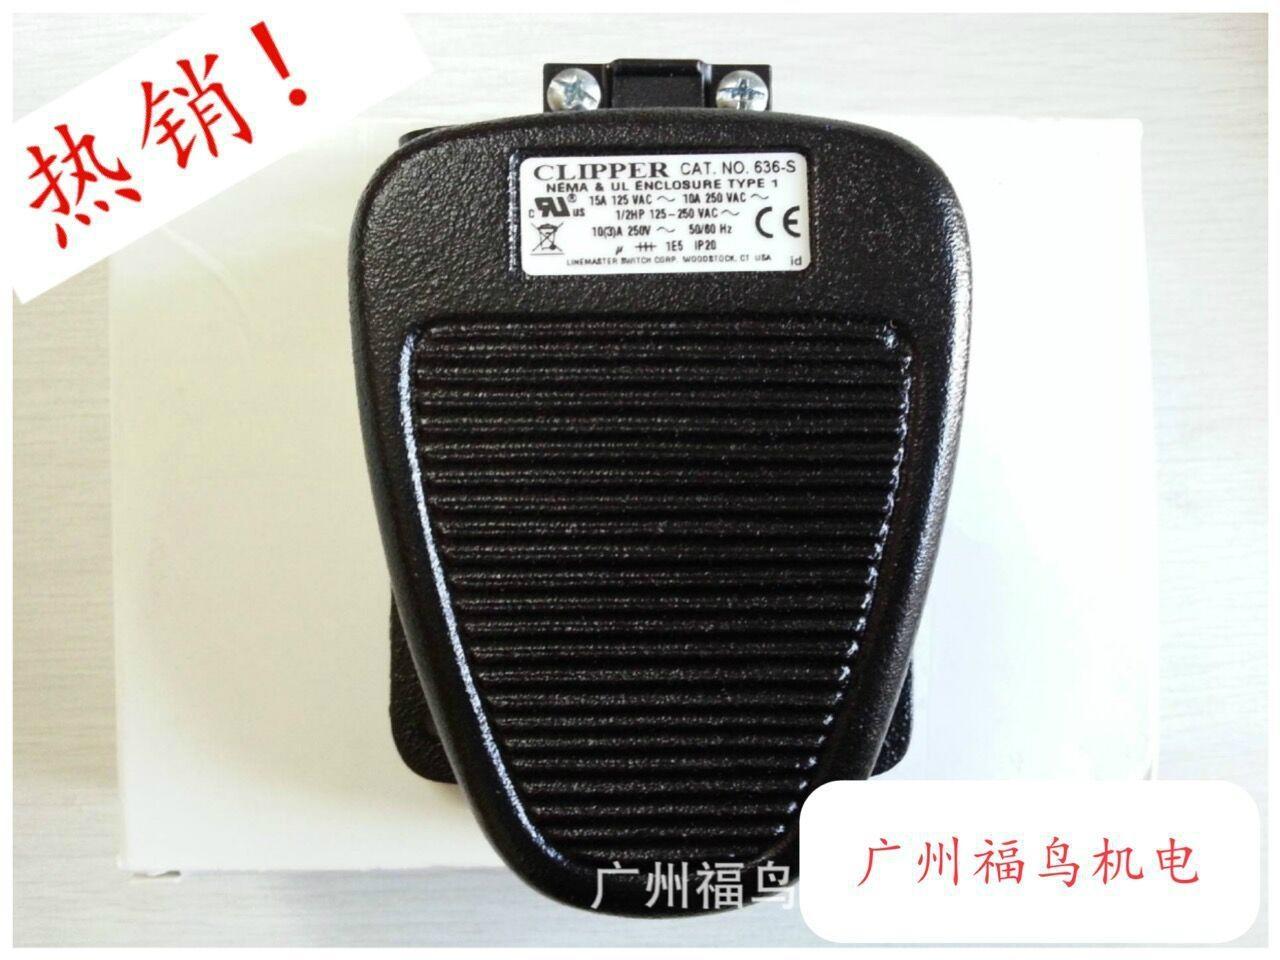 LINEMASTER腳踏開關, 型號: 636-S